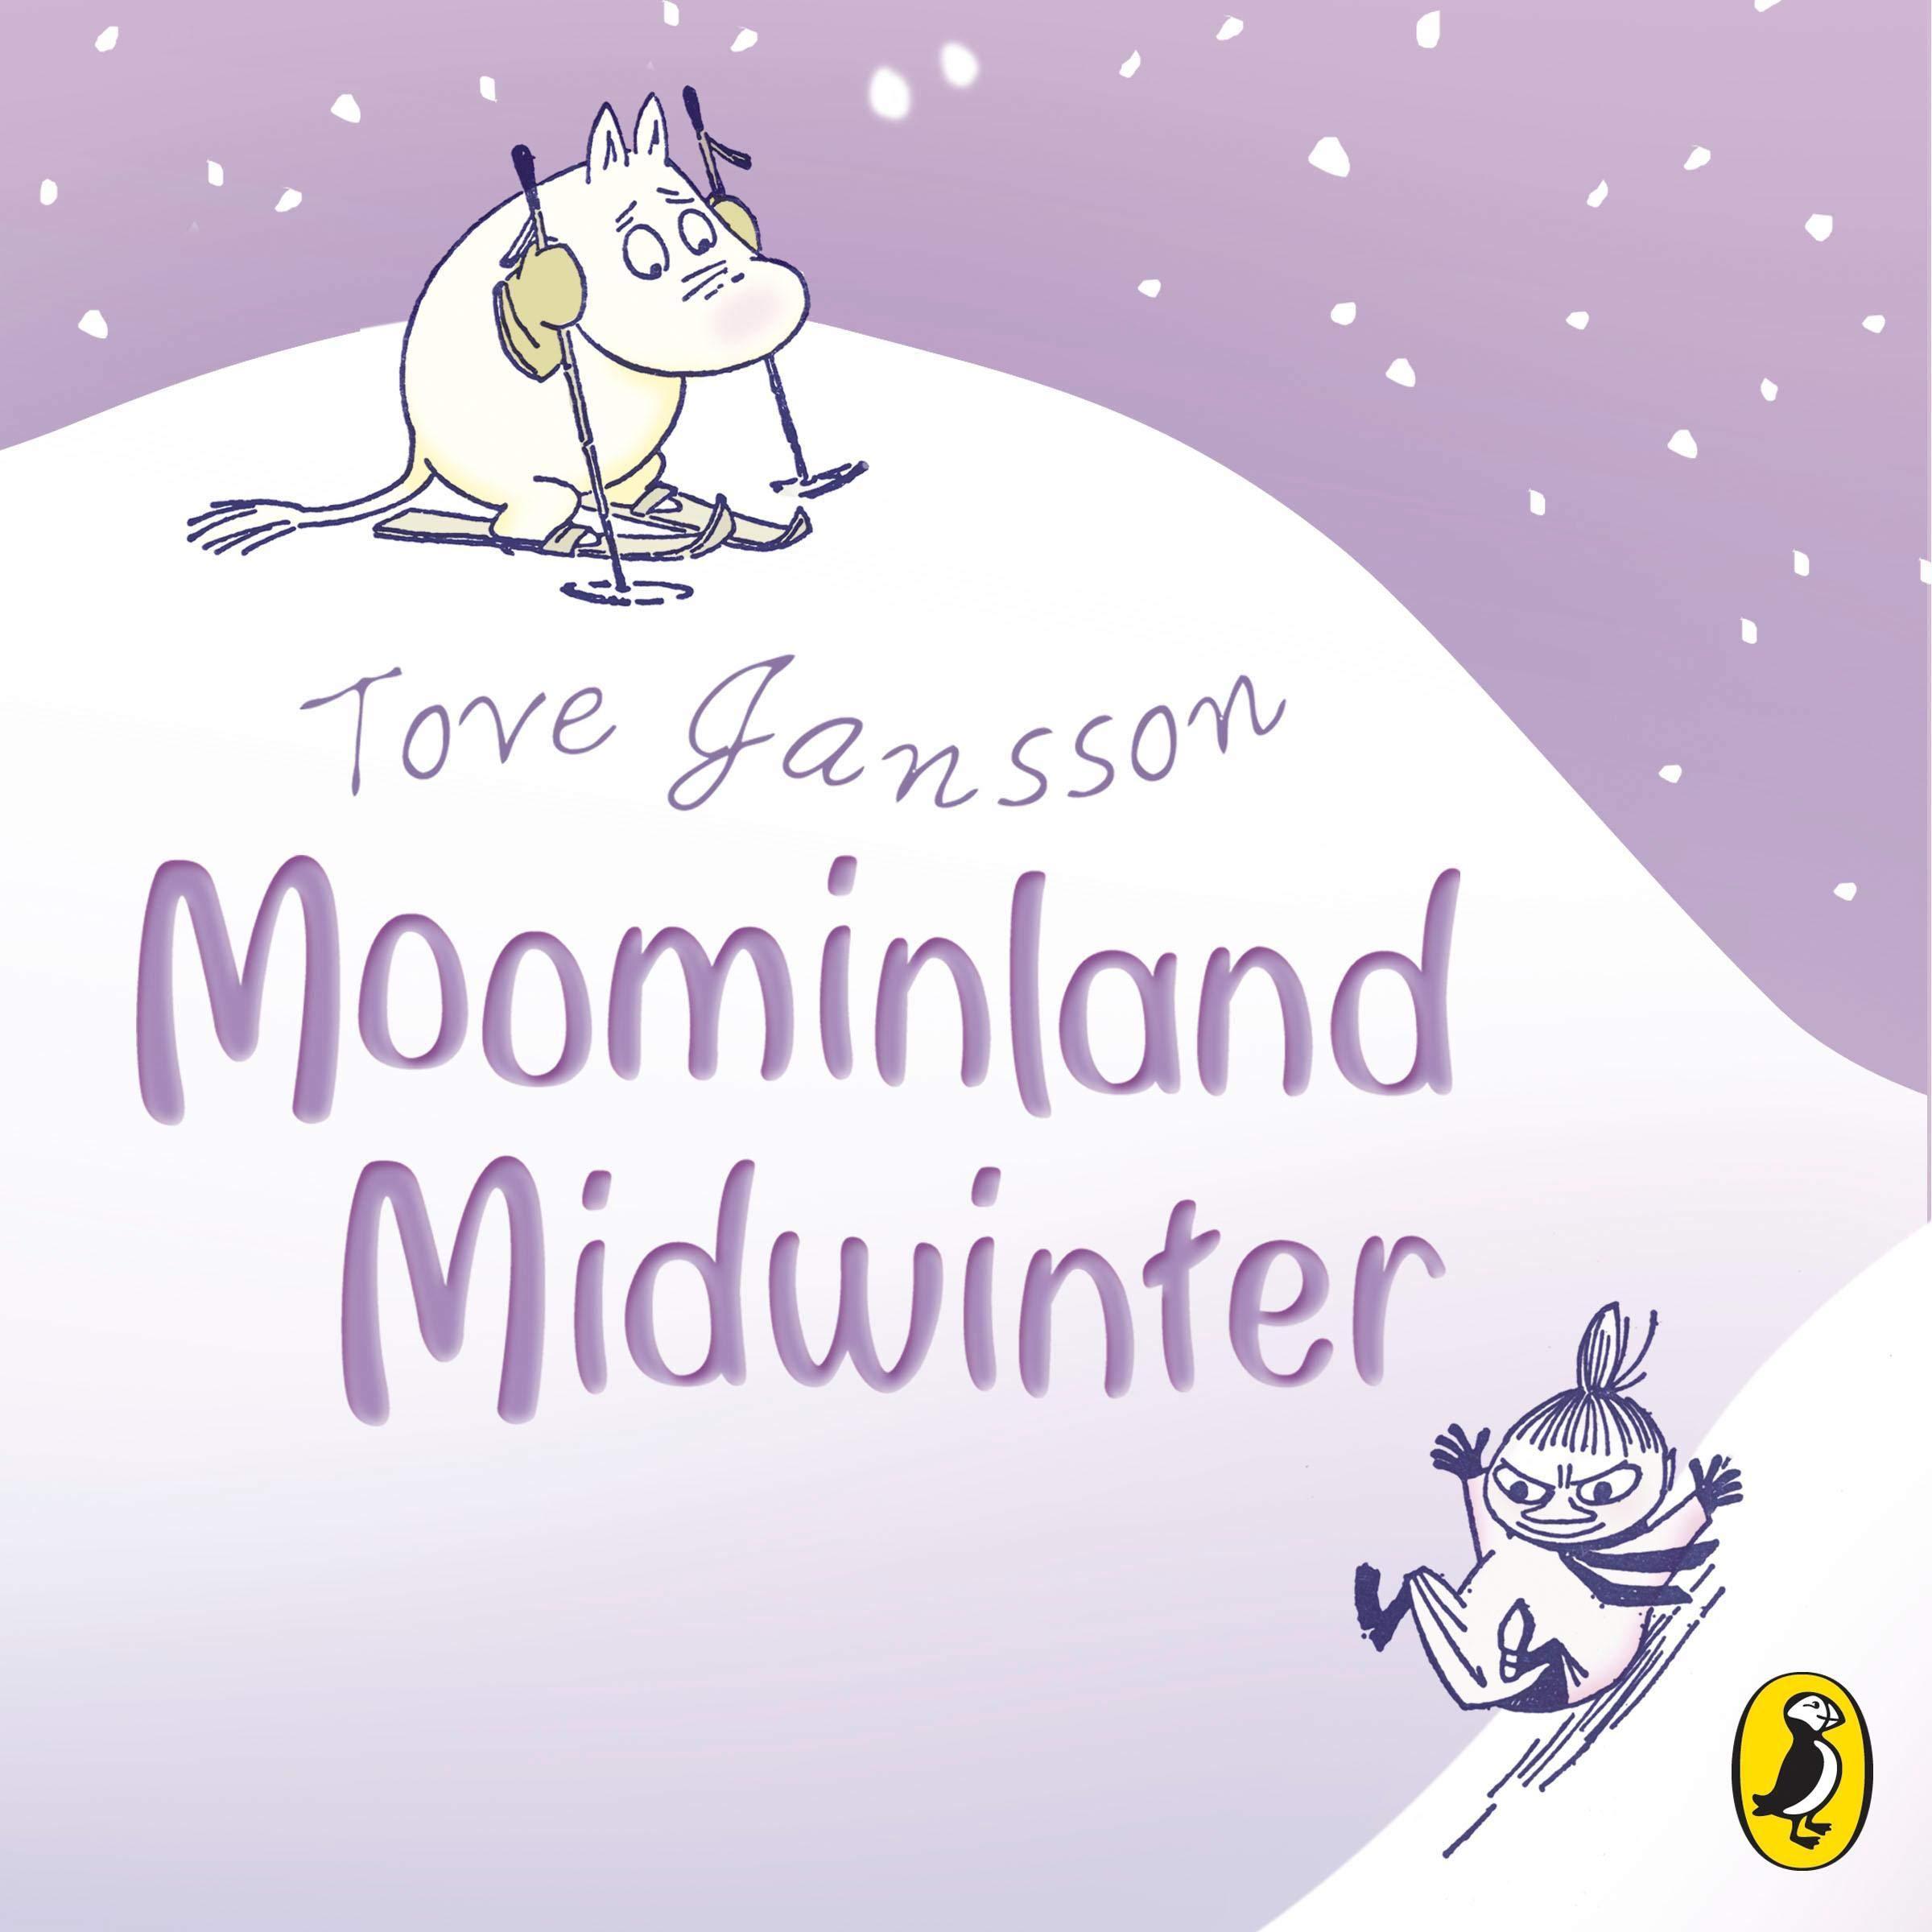 Moominland Midwinter